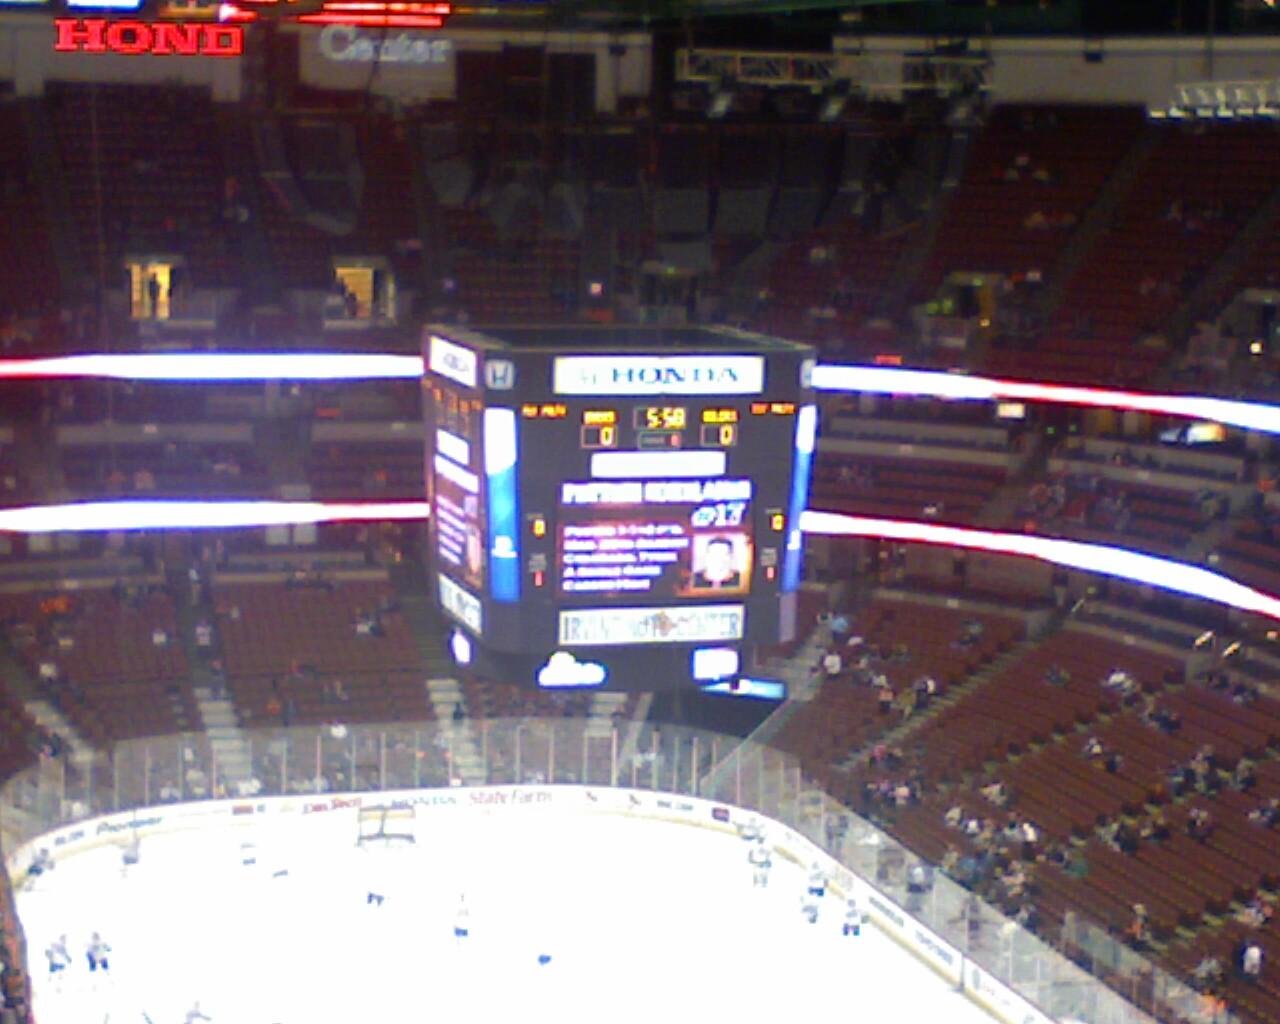 Above the scoreboard